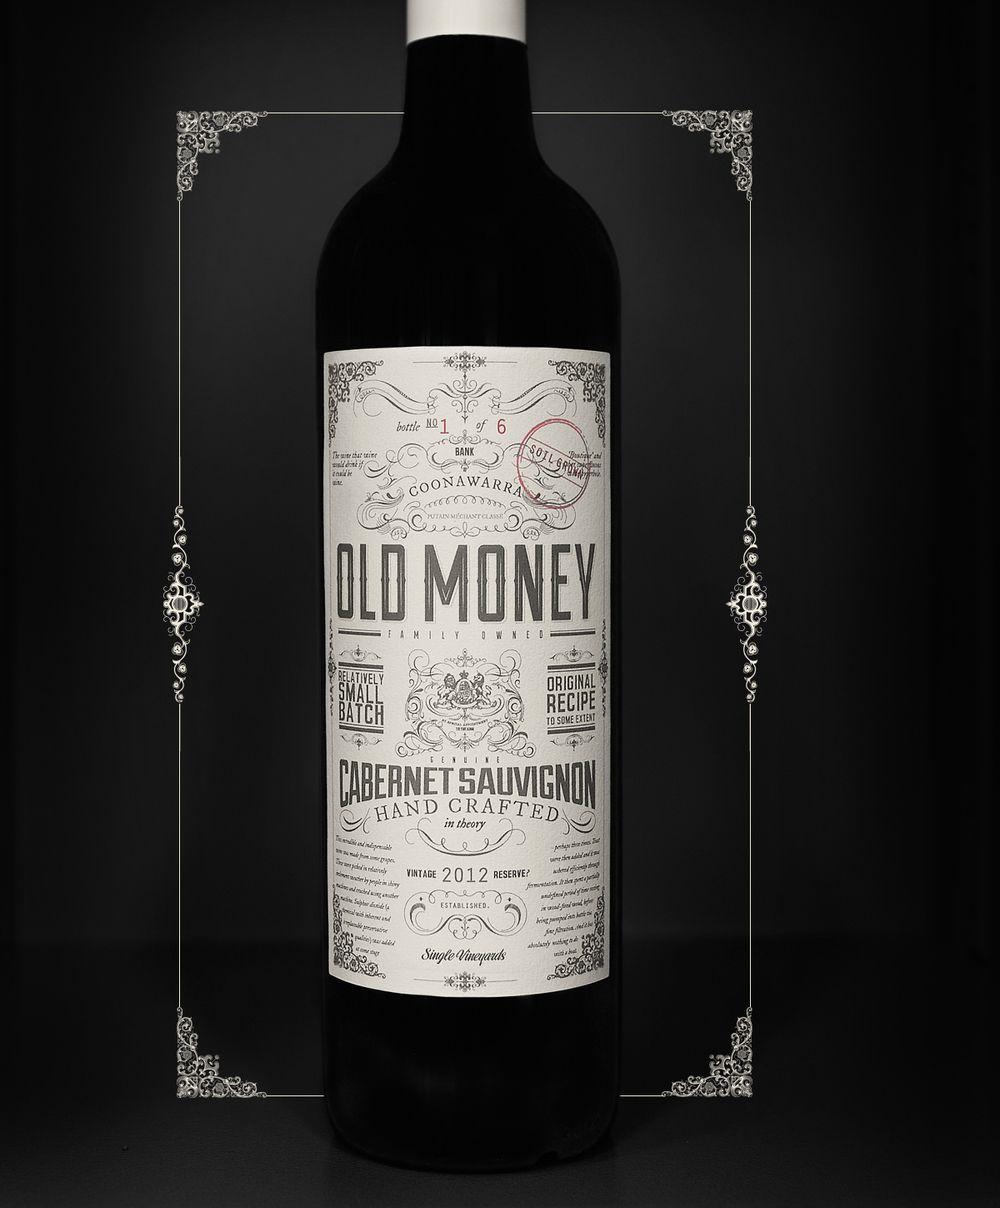 Old Money Cabernet Sauvignon Vintage Wine Label Vintage Wine Wine Design